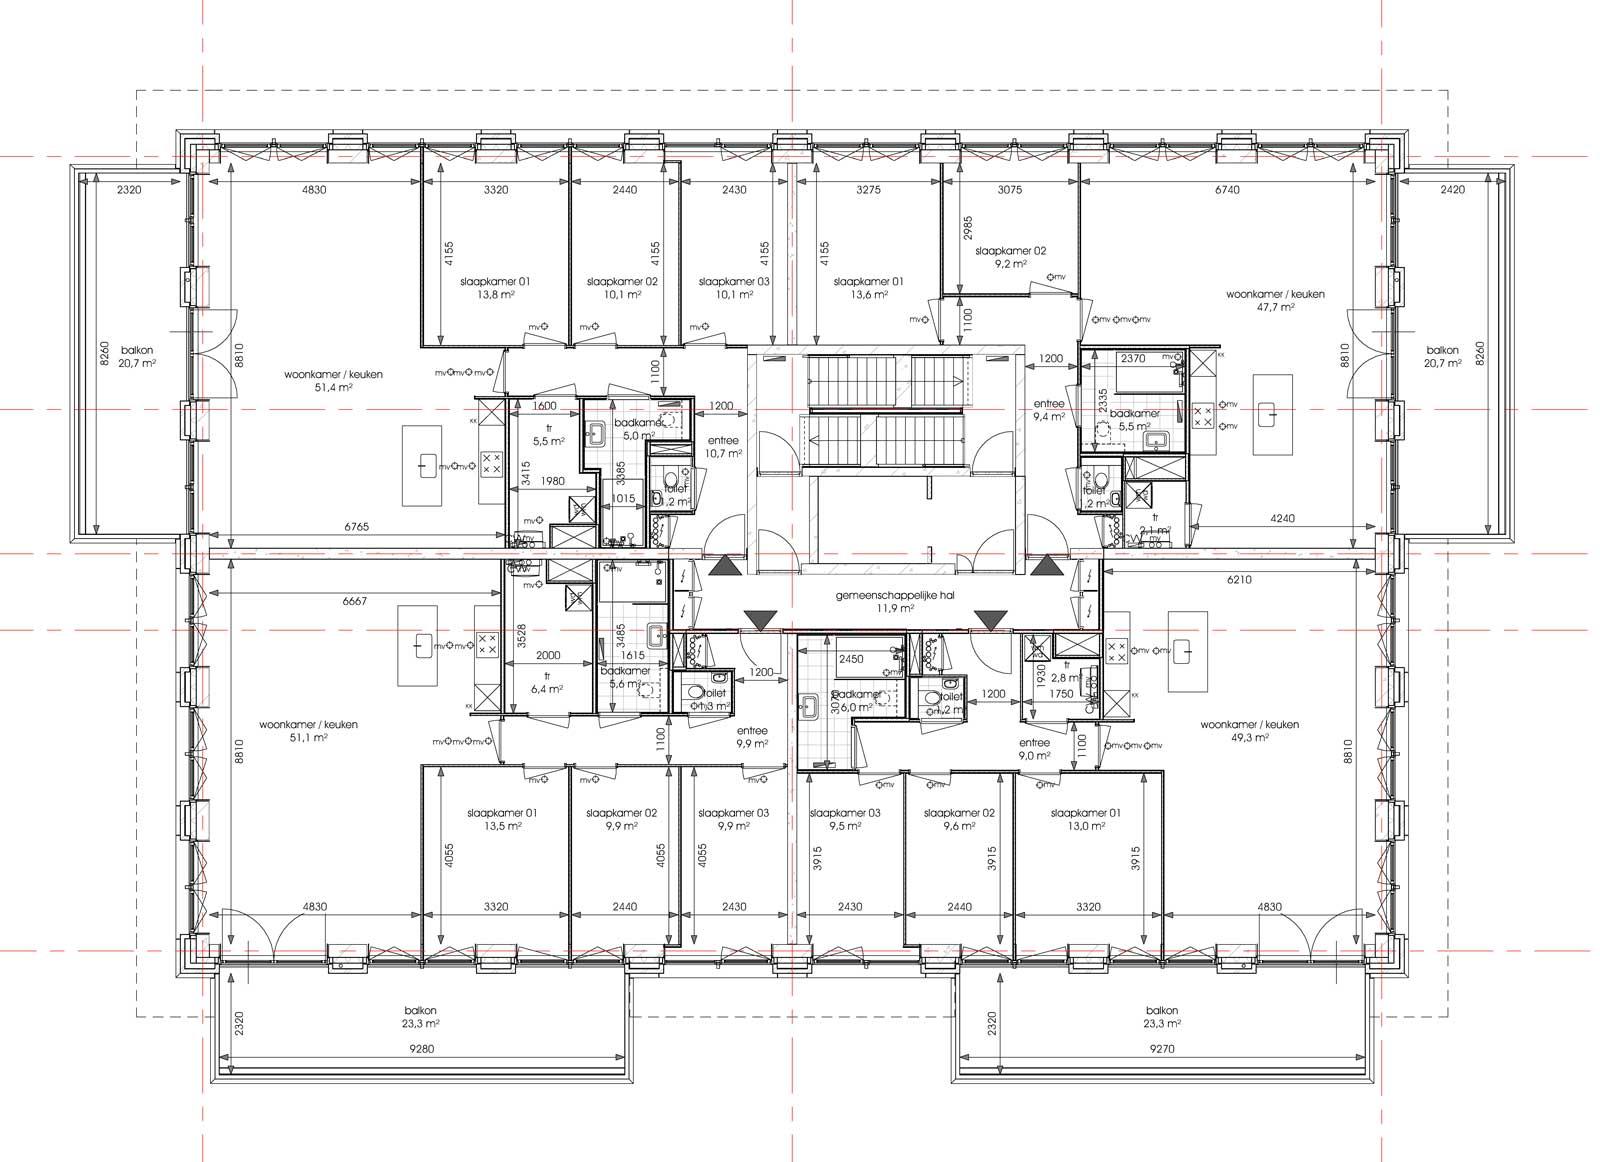 Ede residentie Enka appartementencomplex - Zevende verdieping